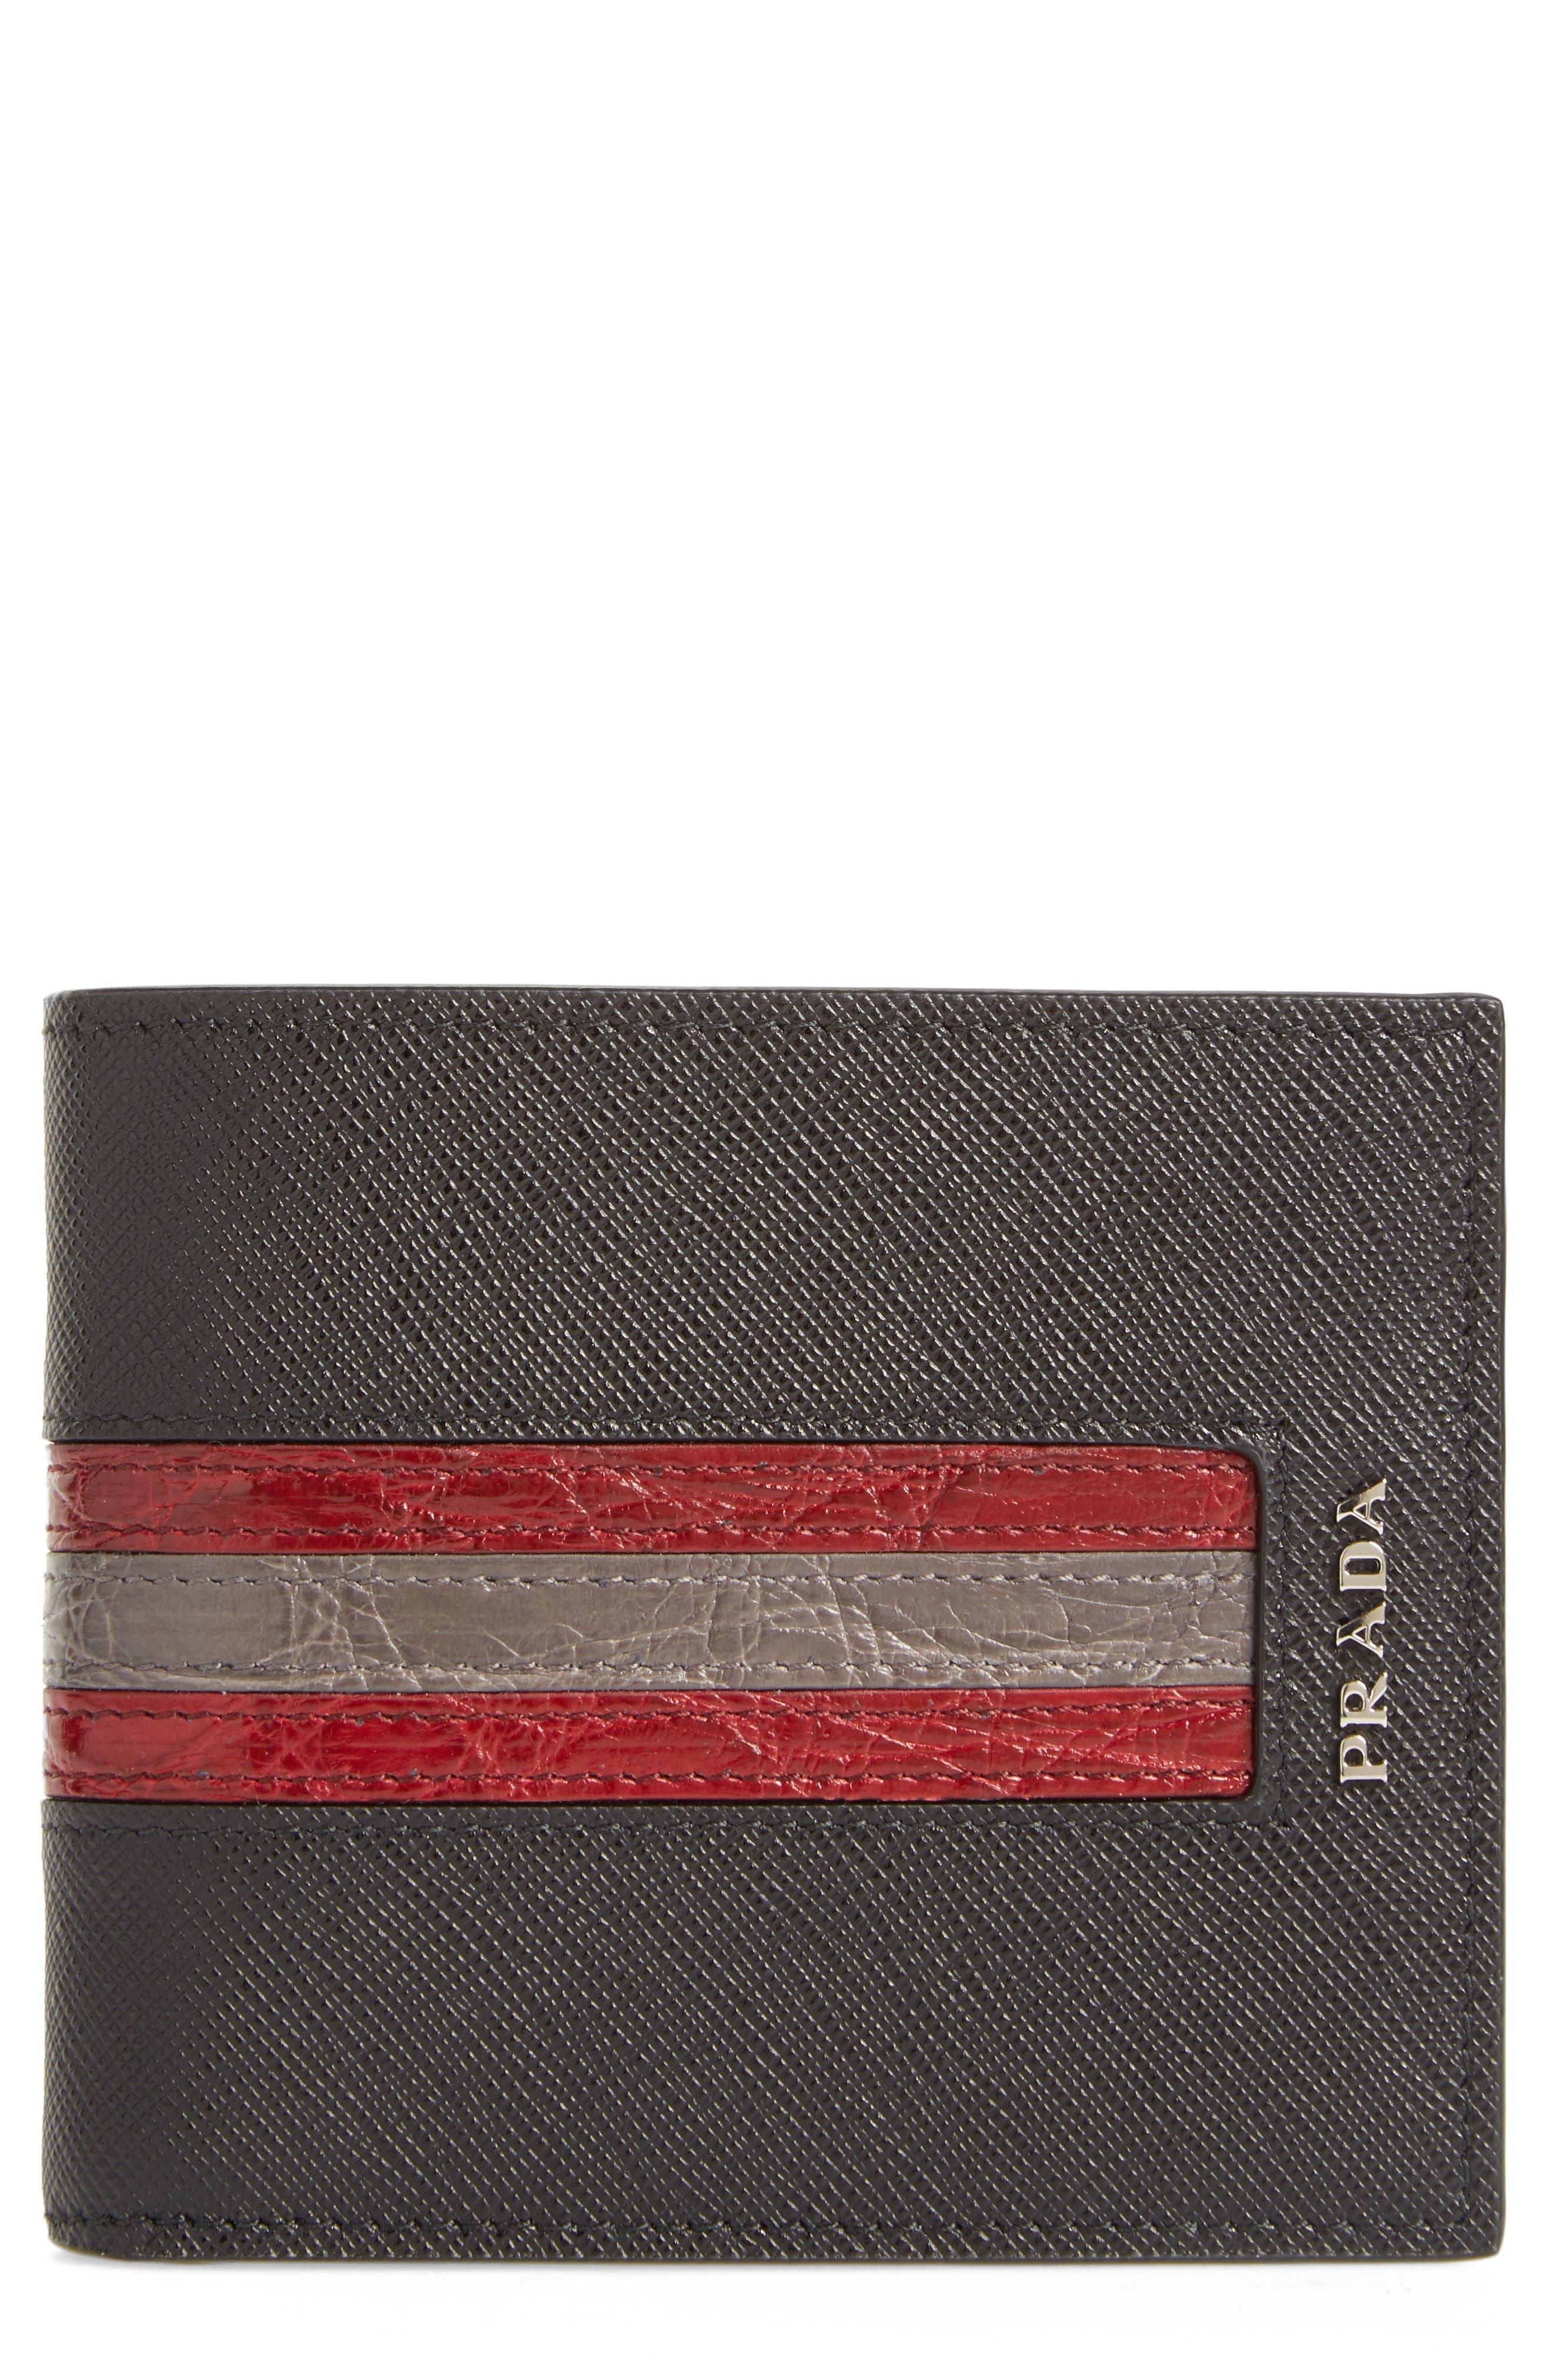 Alternate Image 1 Selected - Prada Saffiano and Crocodile Leather Wallet